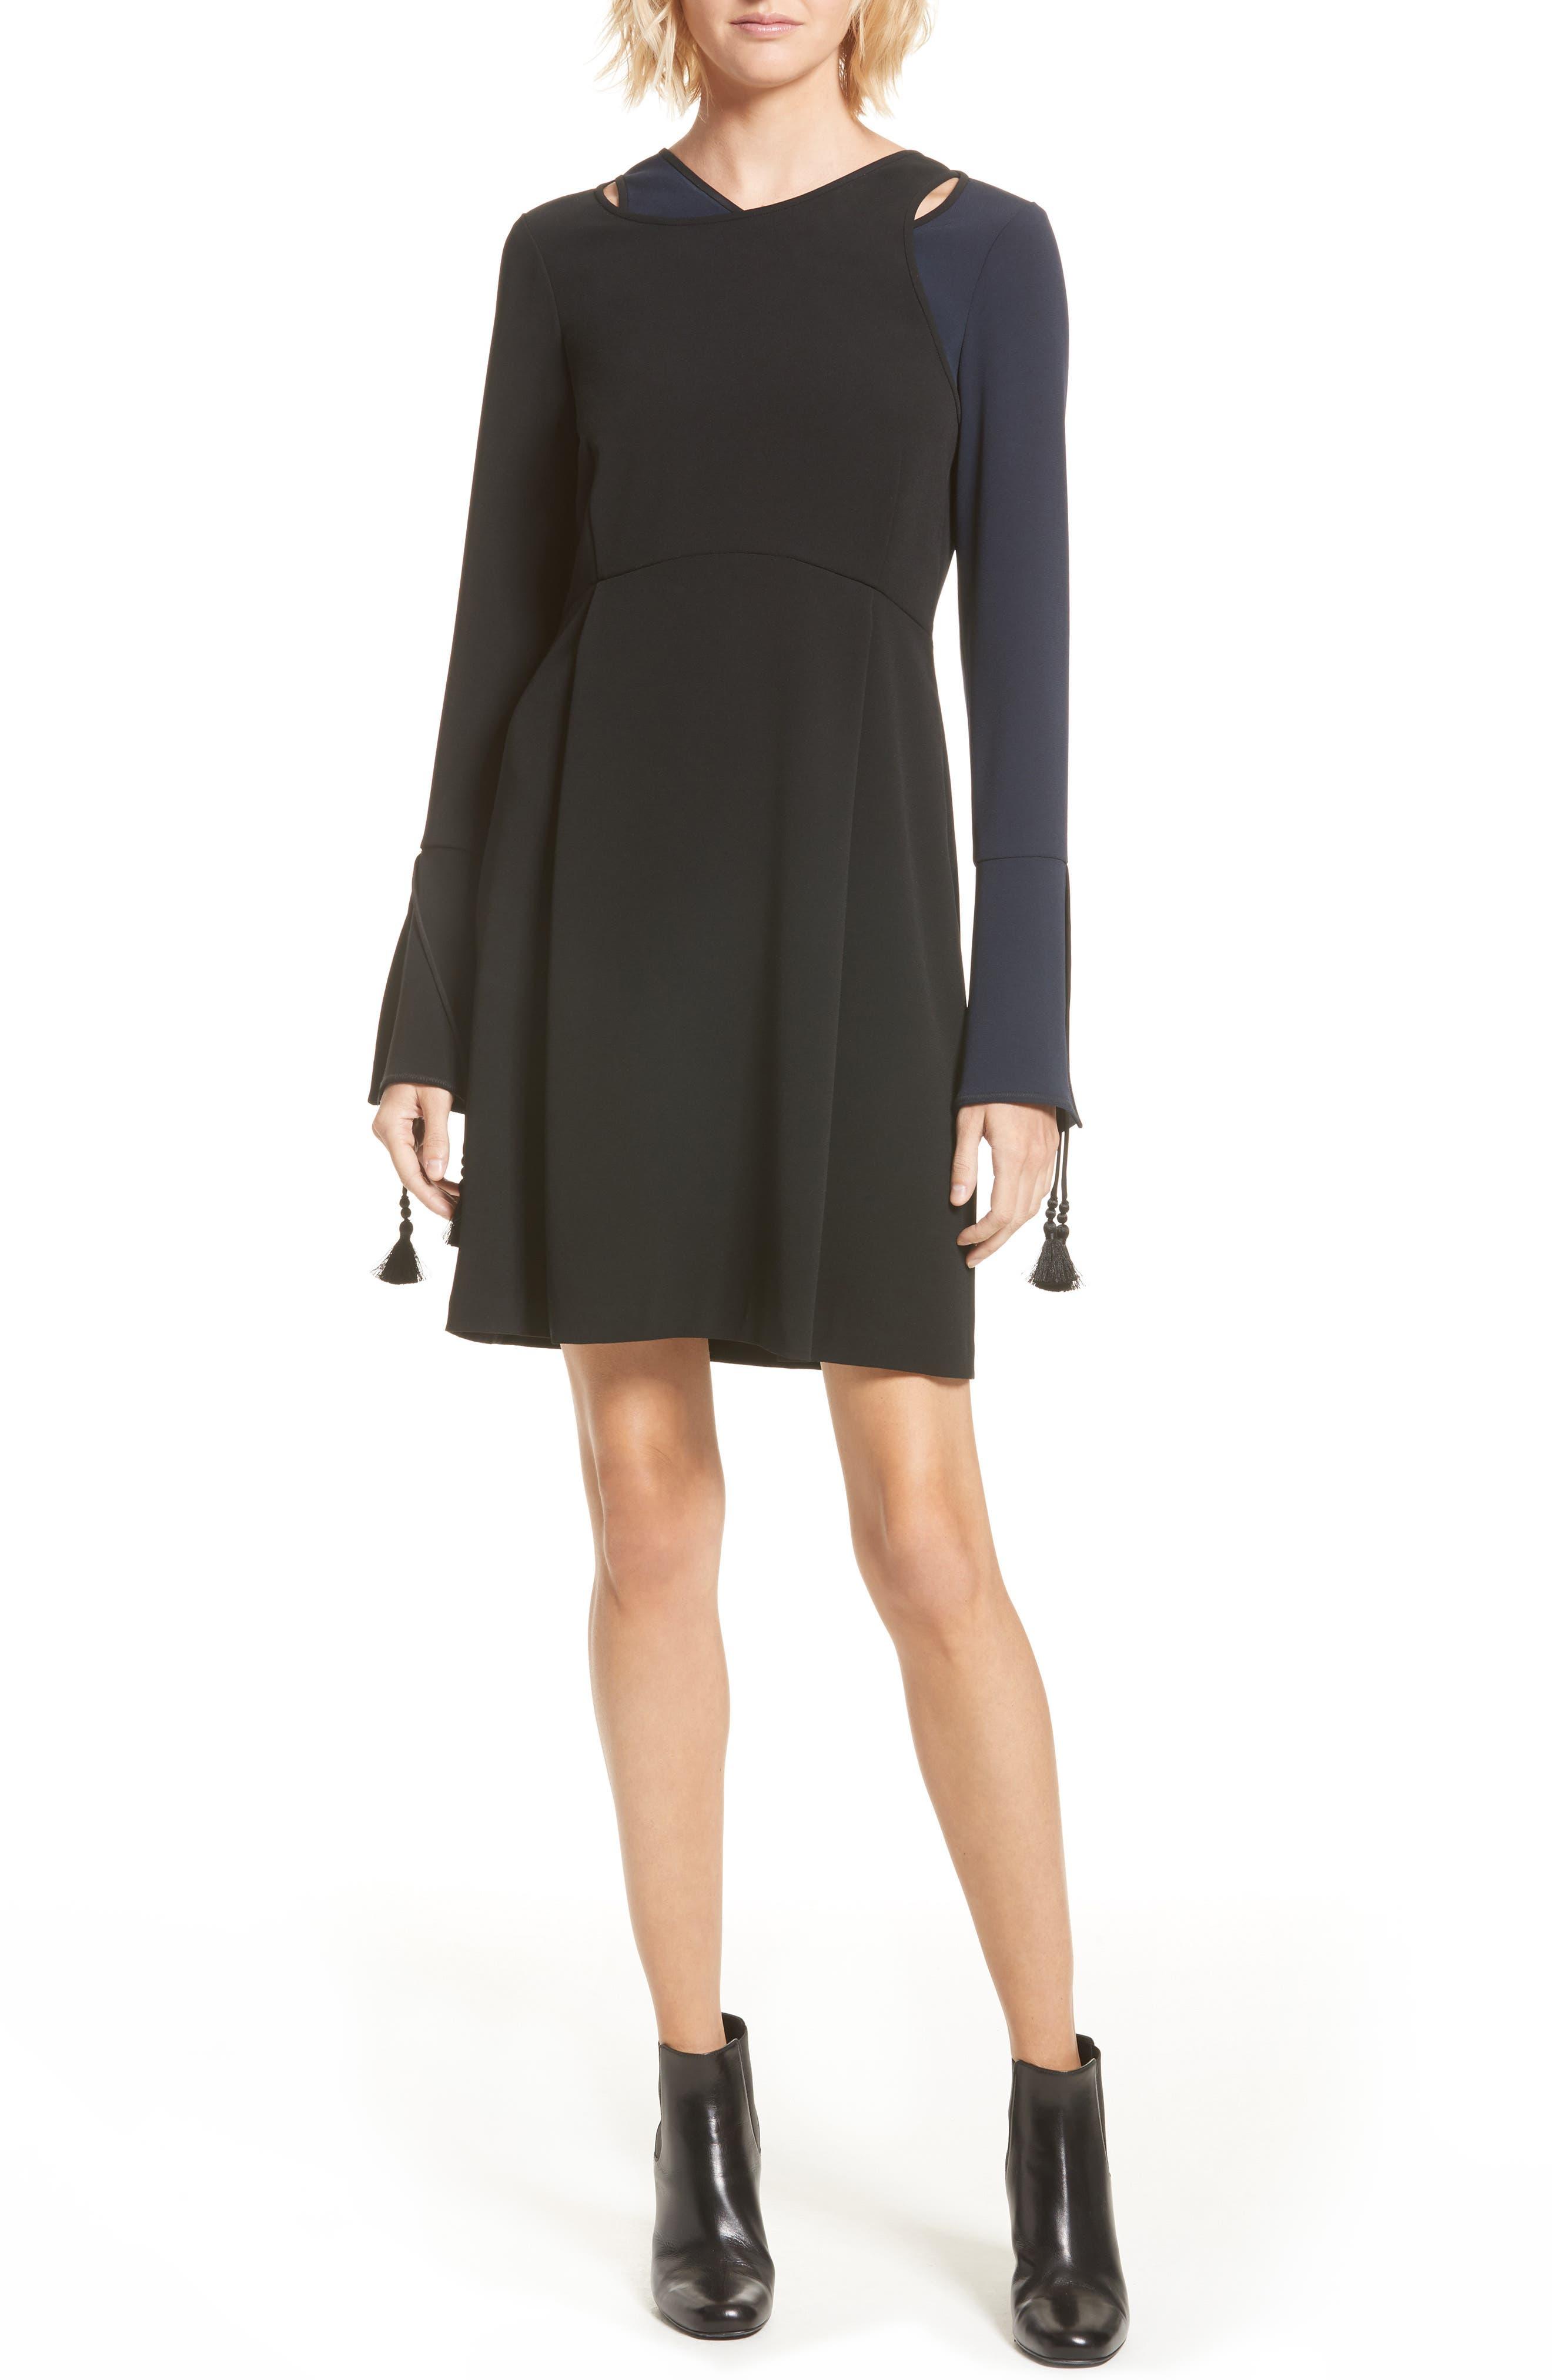 DEREK LAM 10 CROSBY Bell Sleeve Asymmetrical Dress